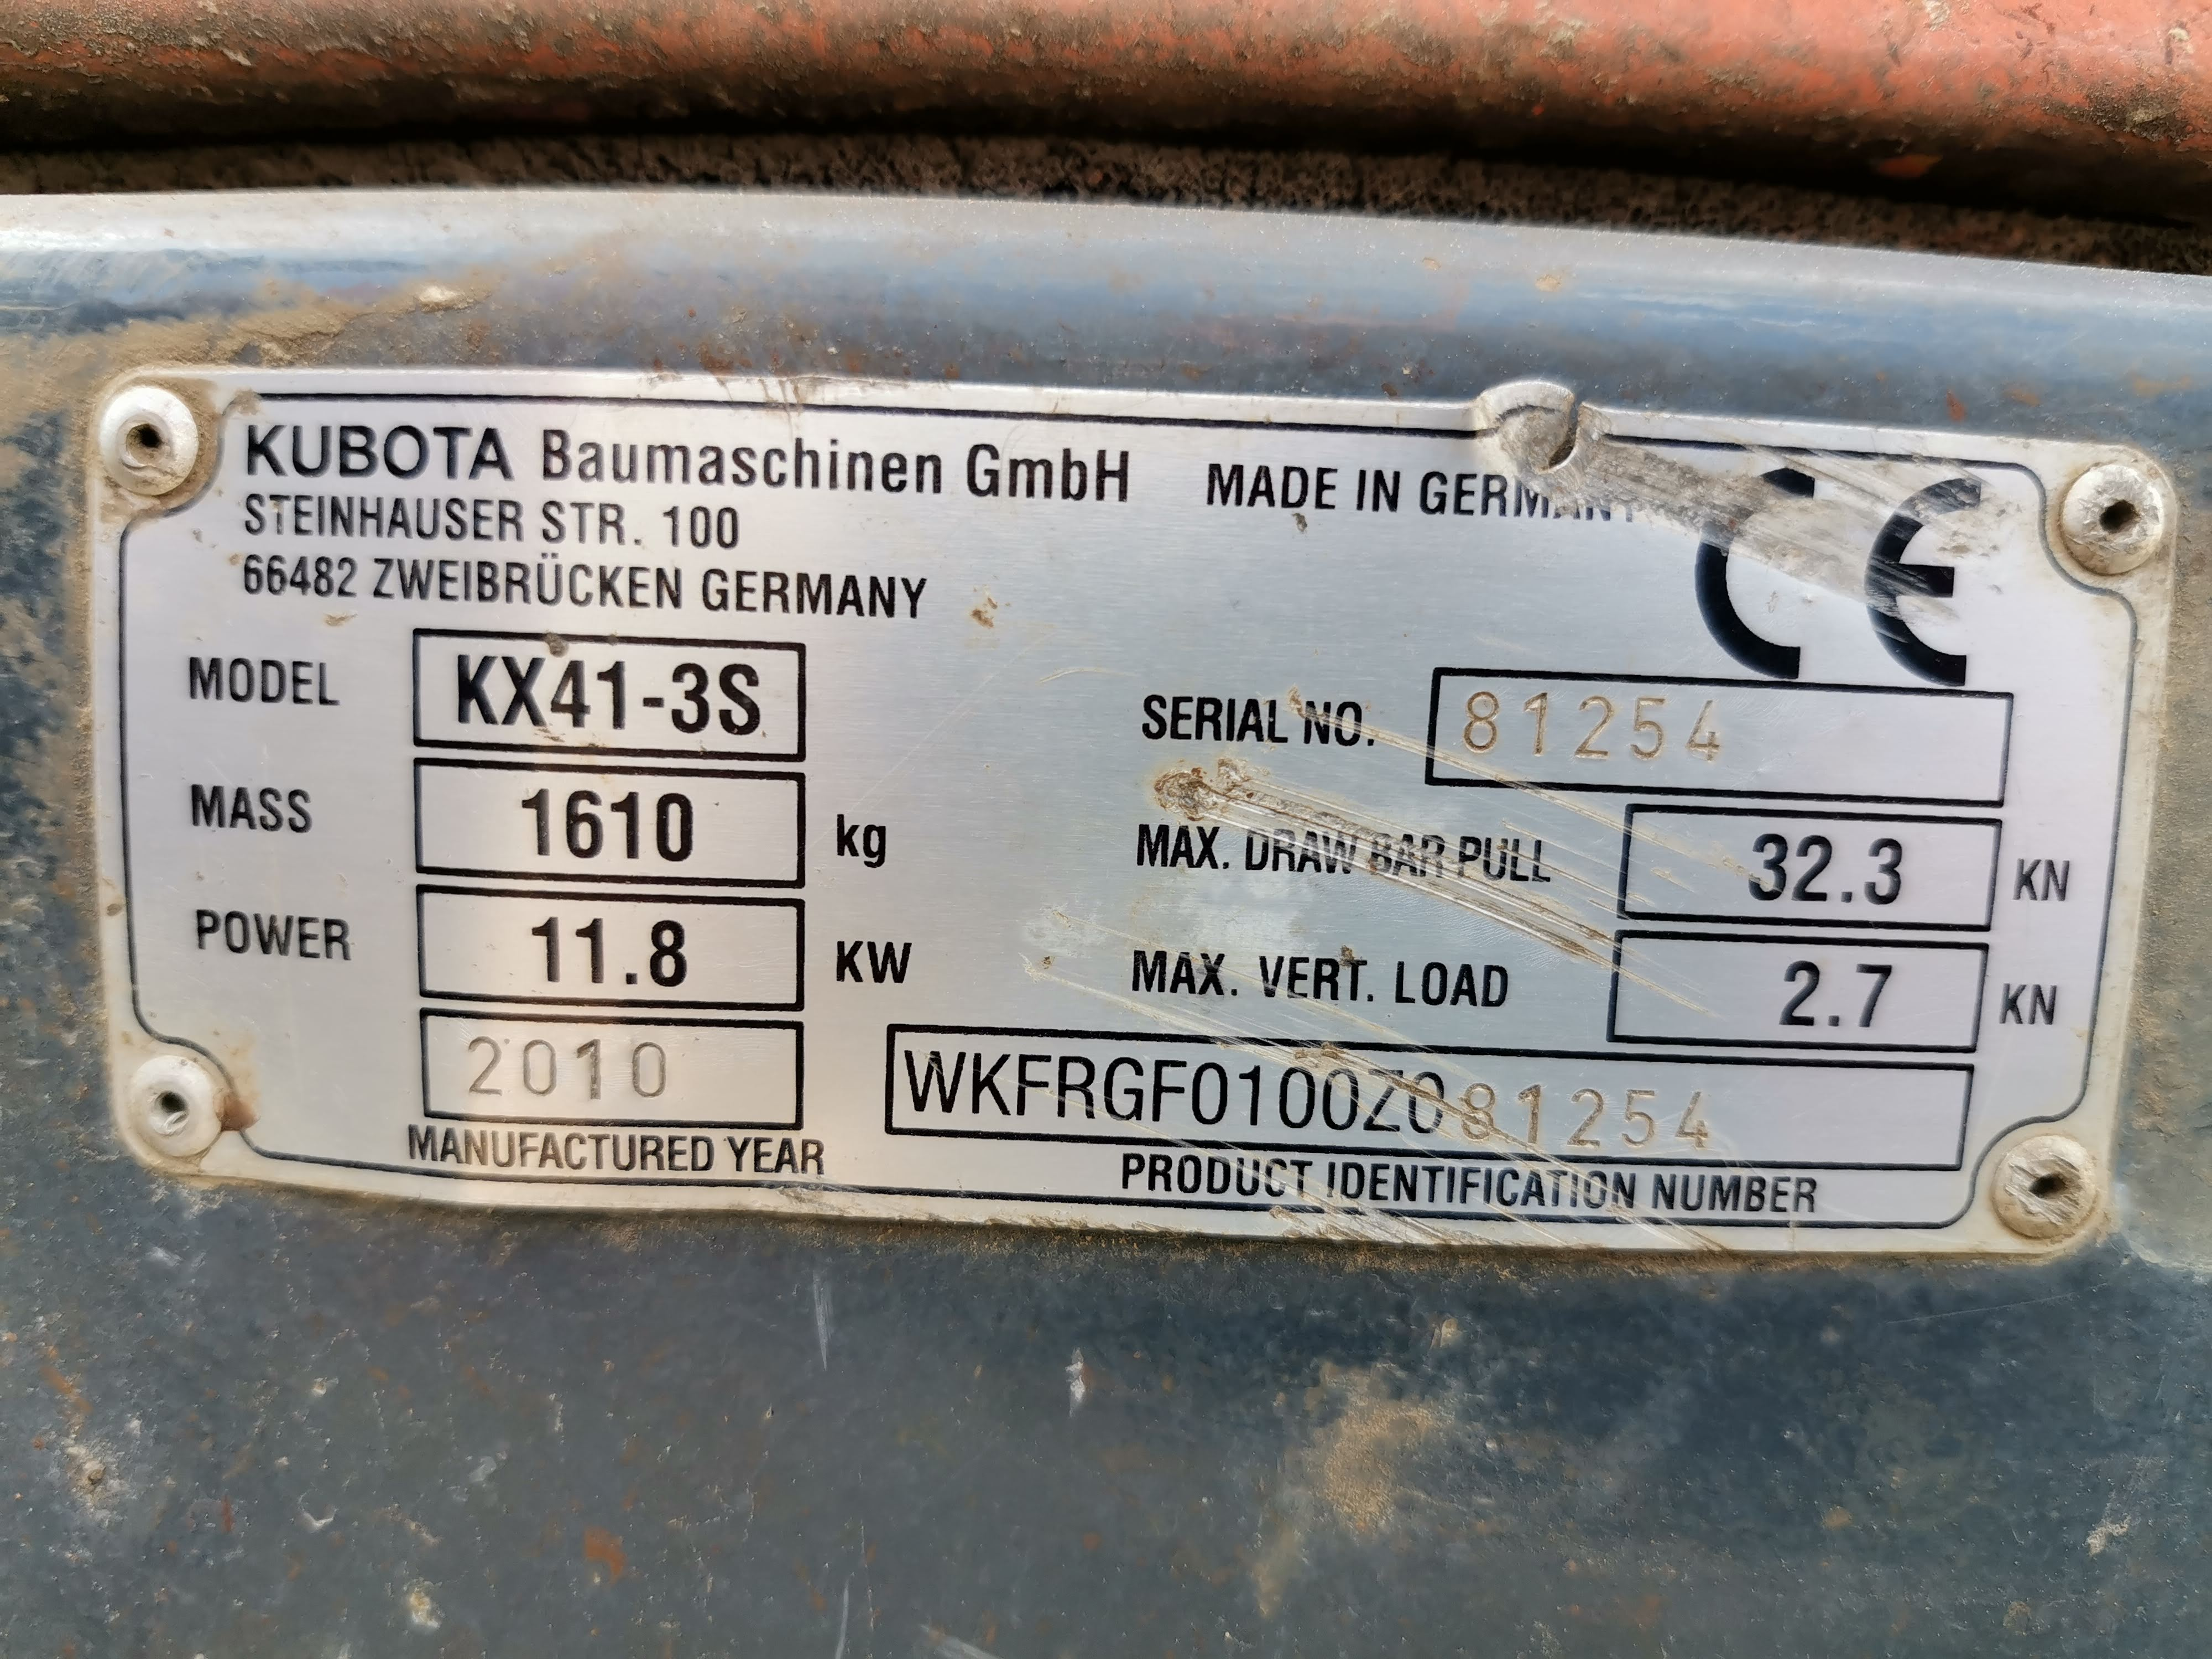 Minibagr Kubota KX41-3S